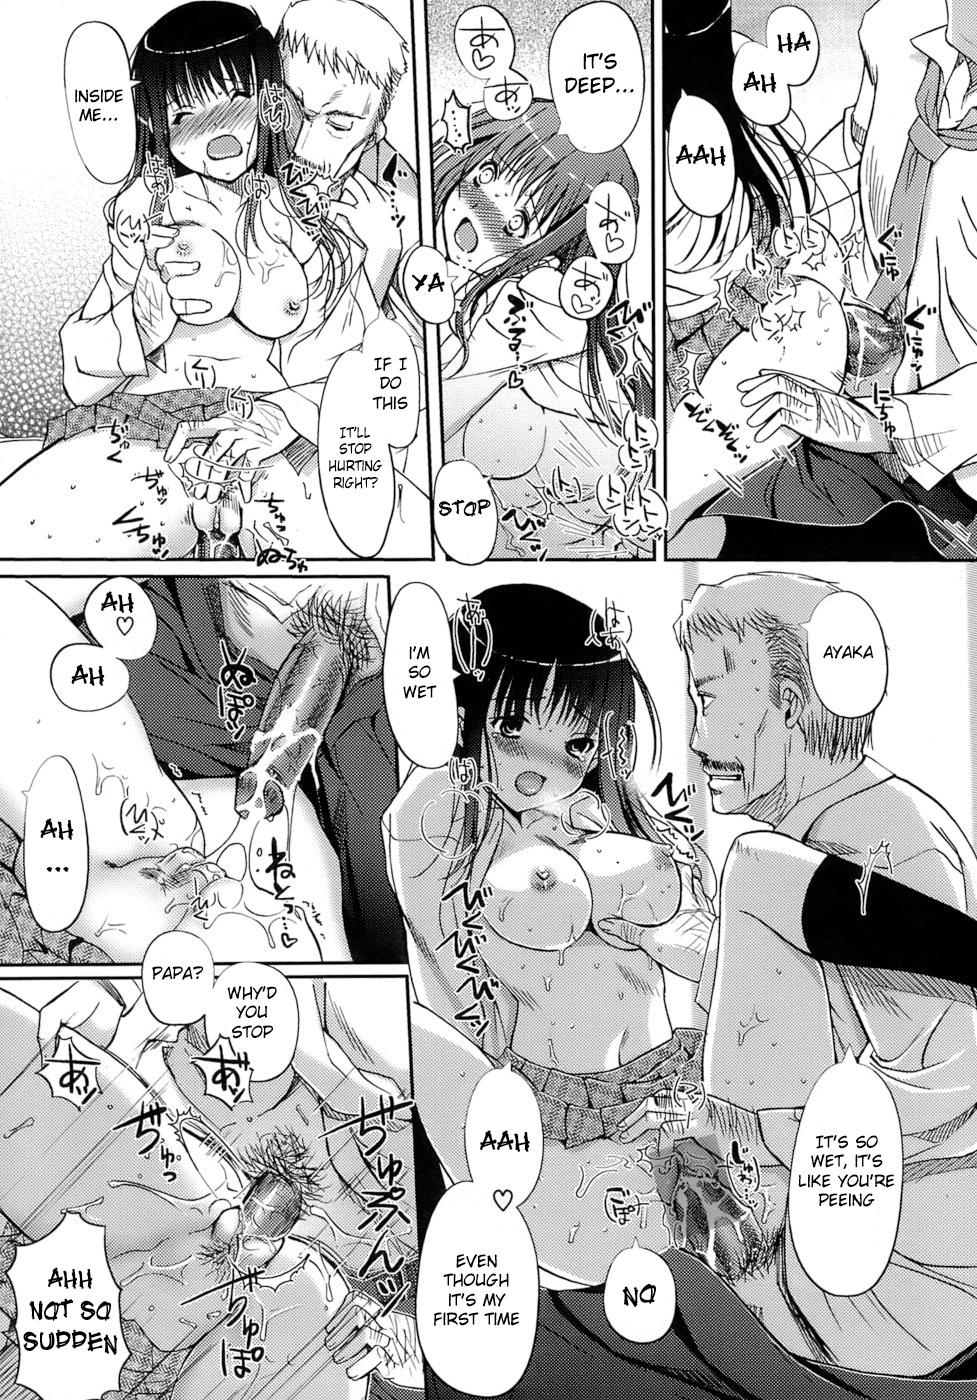 Otome no Renai Jouji - The Maiden's Love Love Affair 108